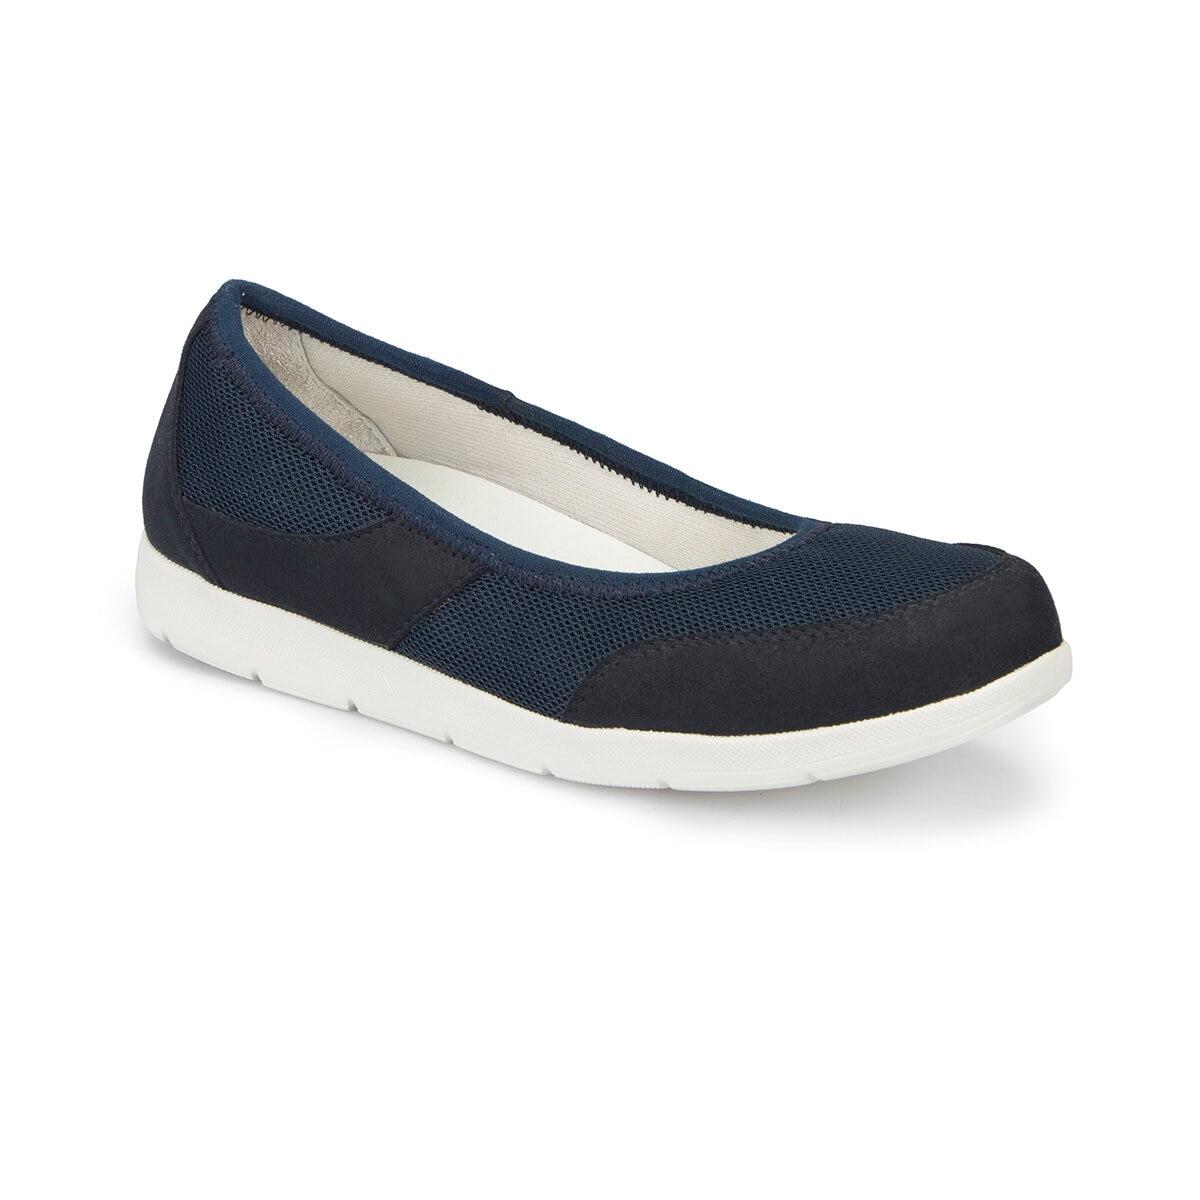 FLO 81.111251.Z Navy Blue Women Basic Comfort Polaris